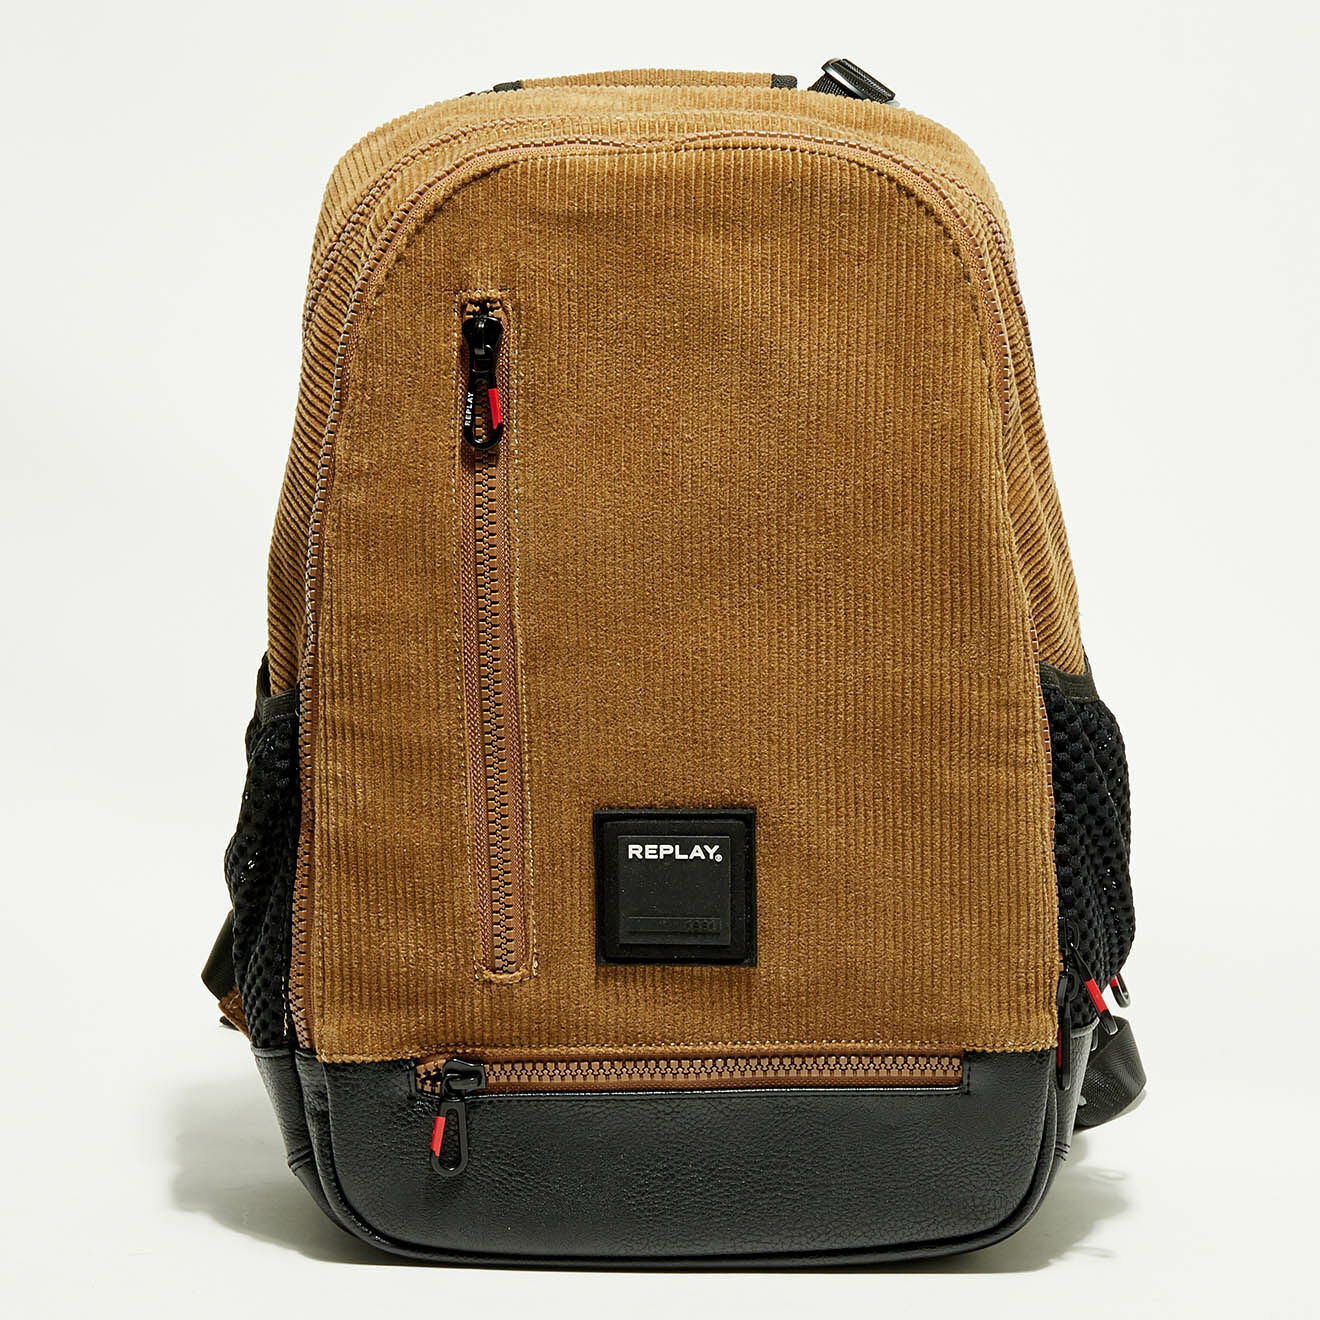 Sac à dos velours côtelés marron - 30x46x16 cm - Replay - Modalova